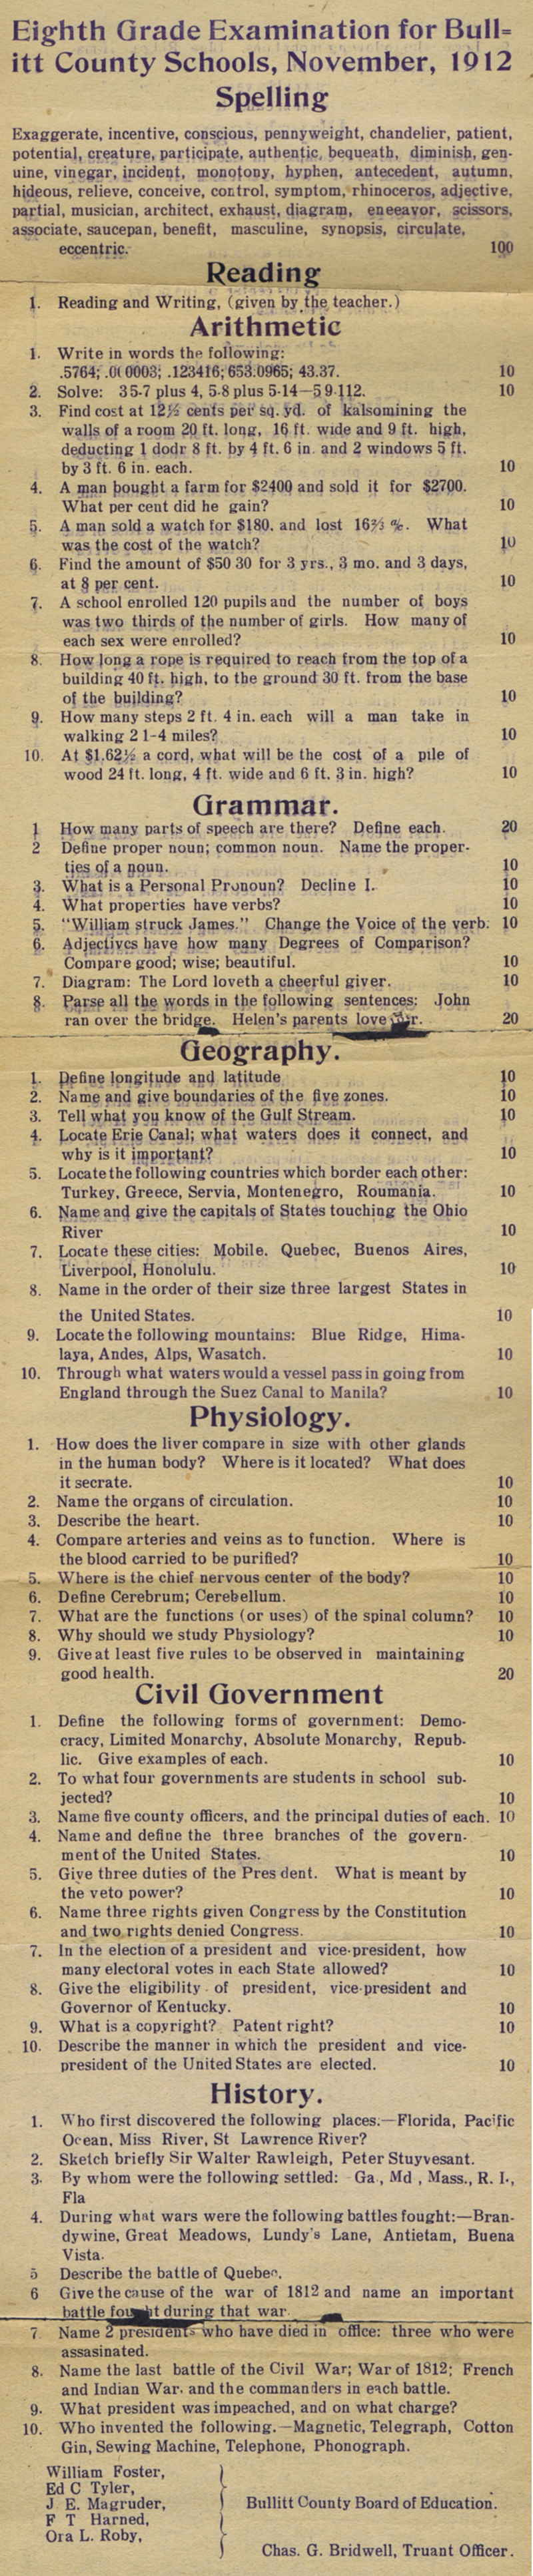 bcschoolexam1912sm